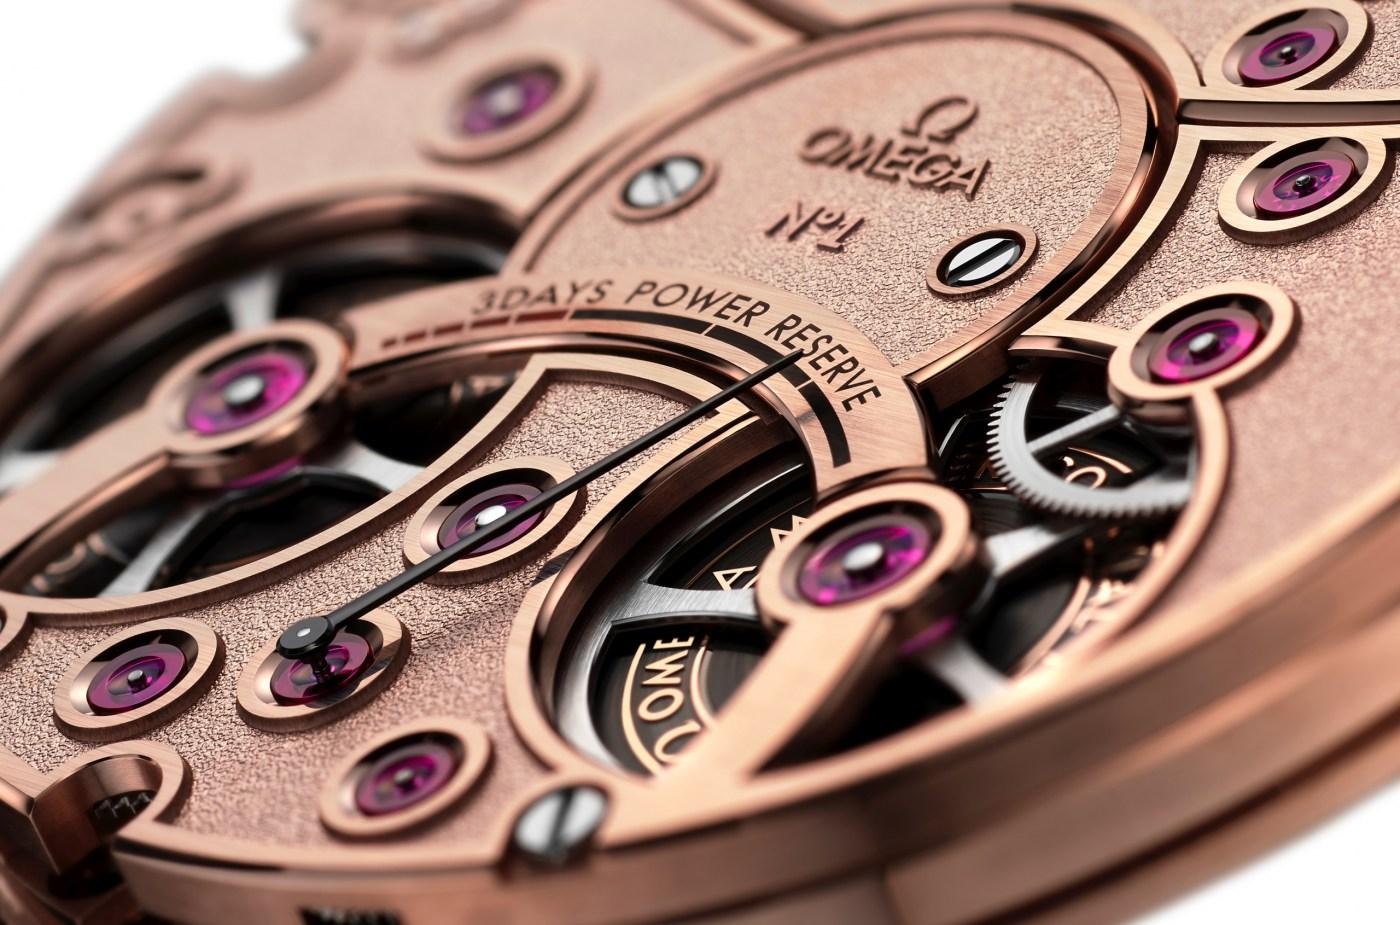 Omega De Ville Tourbillon Master Chronometer Numbered Edition caseback